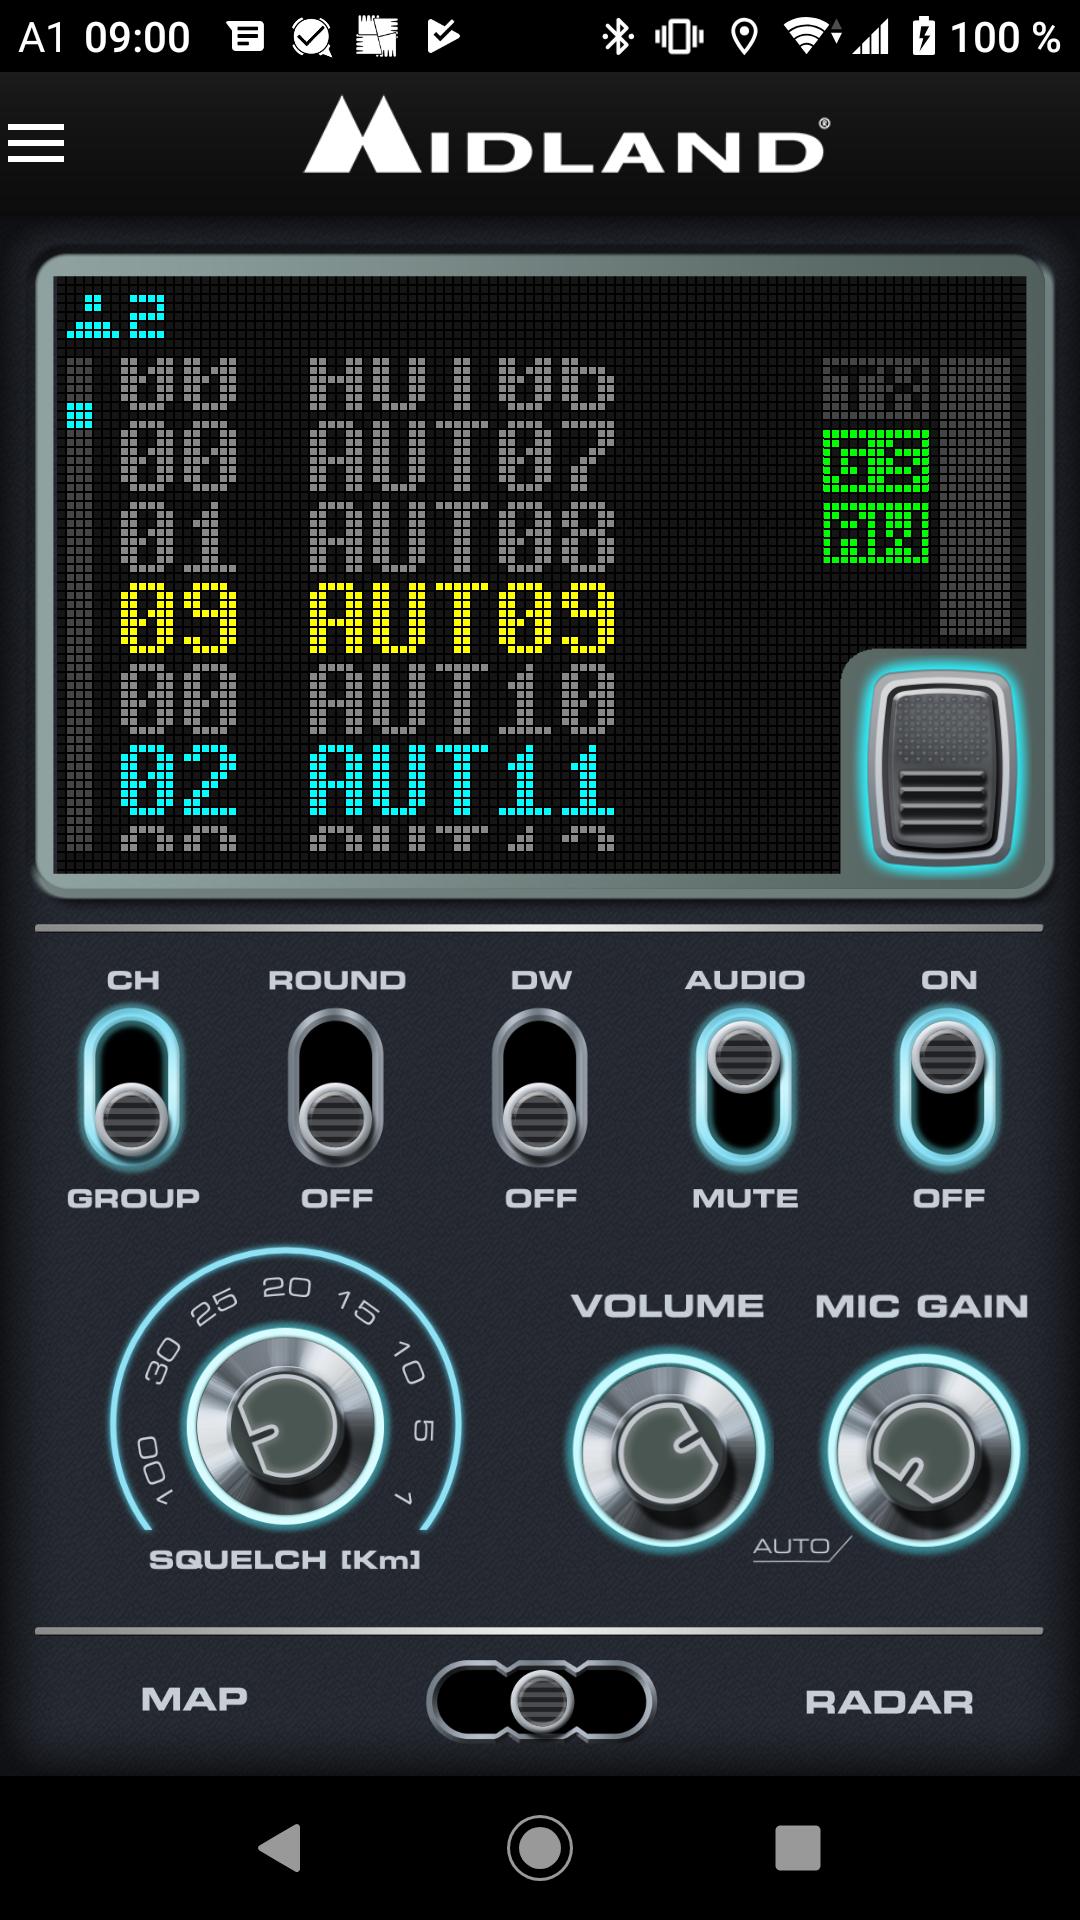 CBtalk AUT09 app